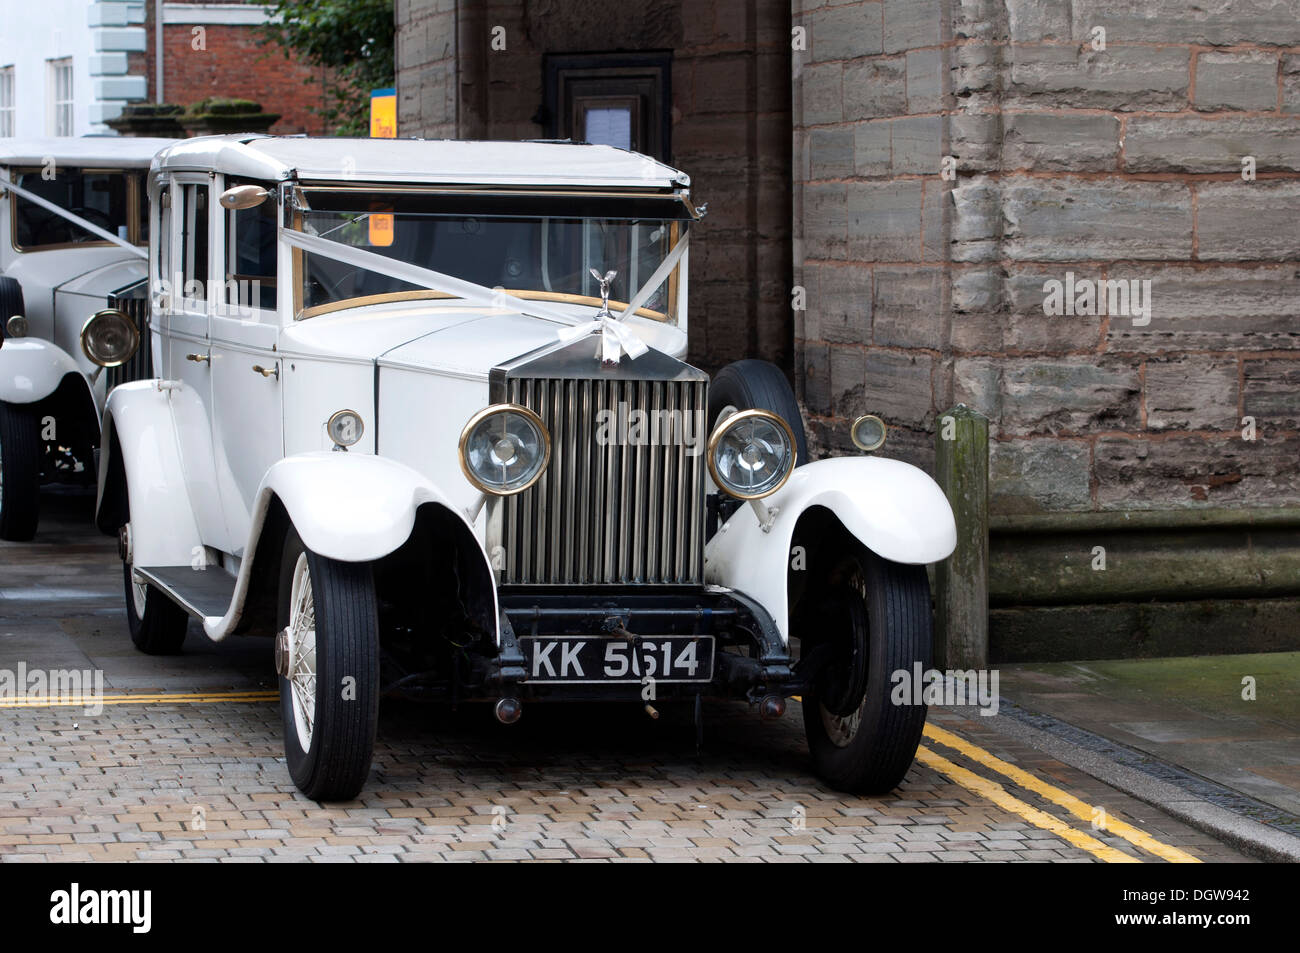 White vintage Rolls-Royce wedding cars Stock Photo: 62021570 - Alamy